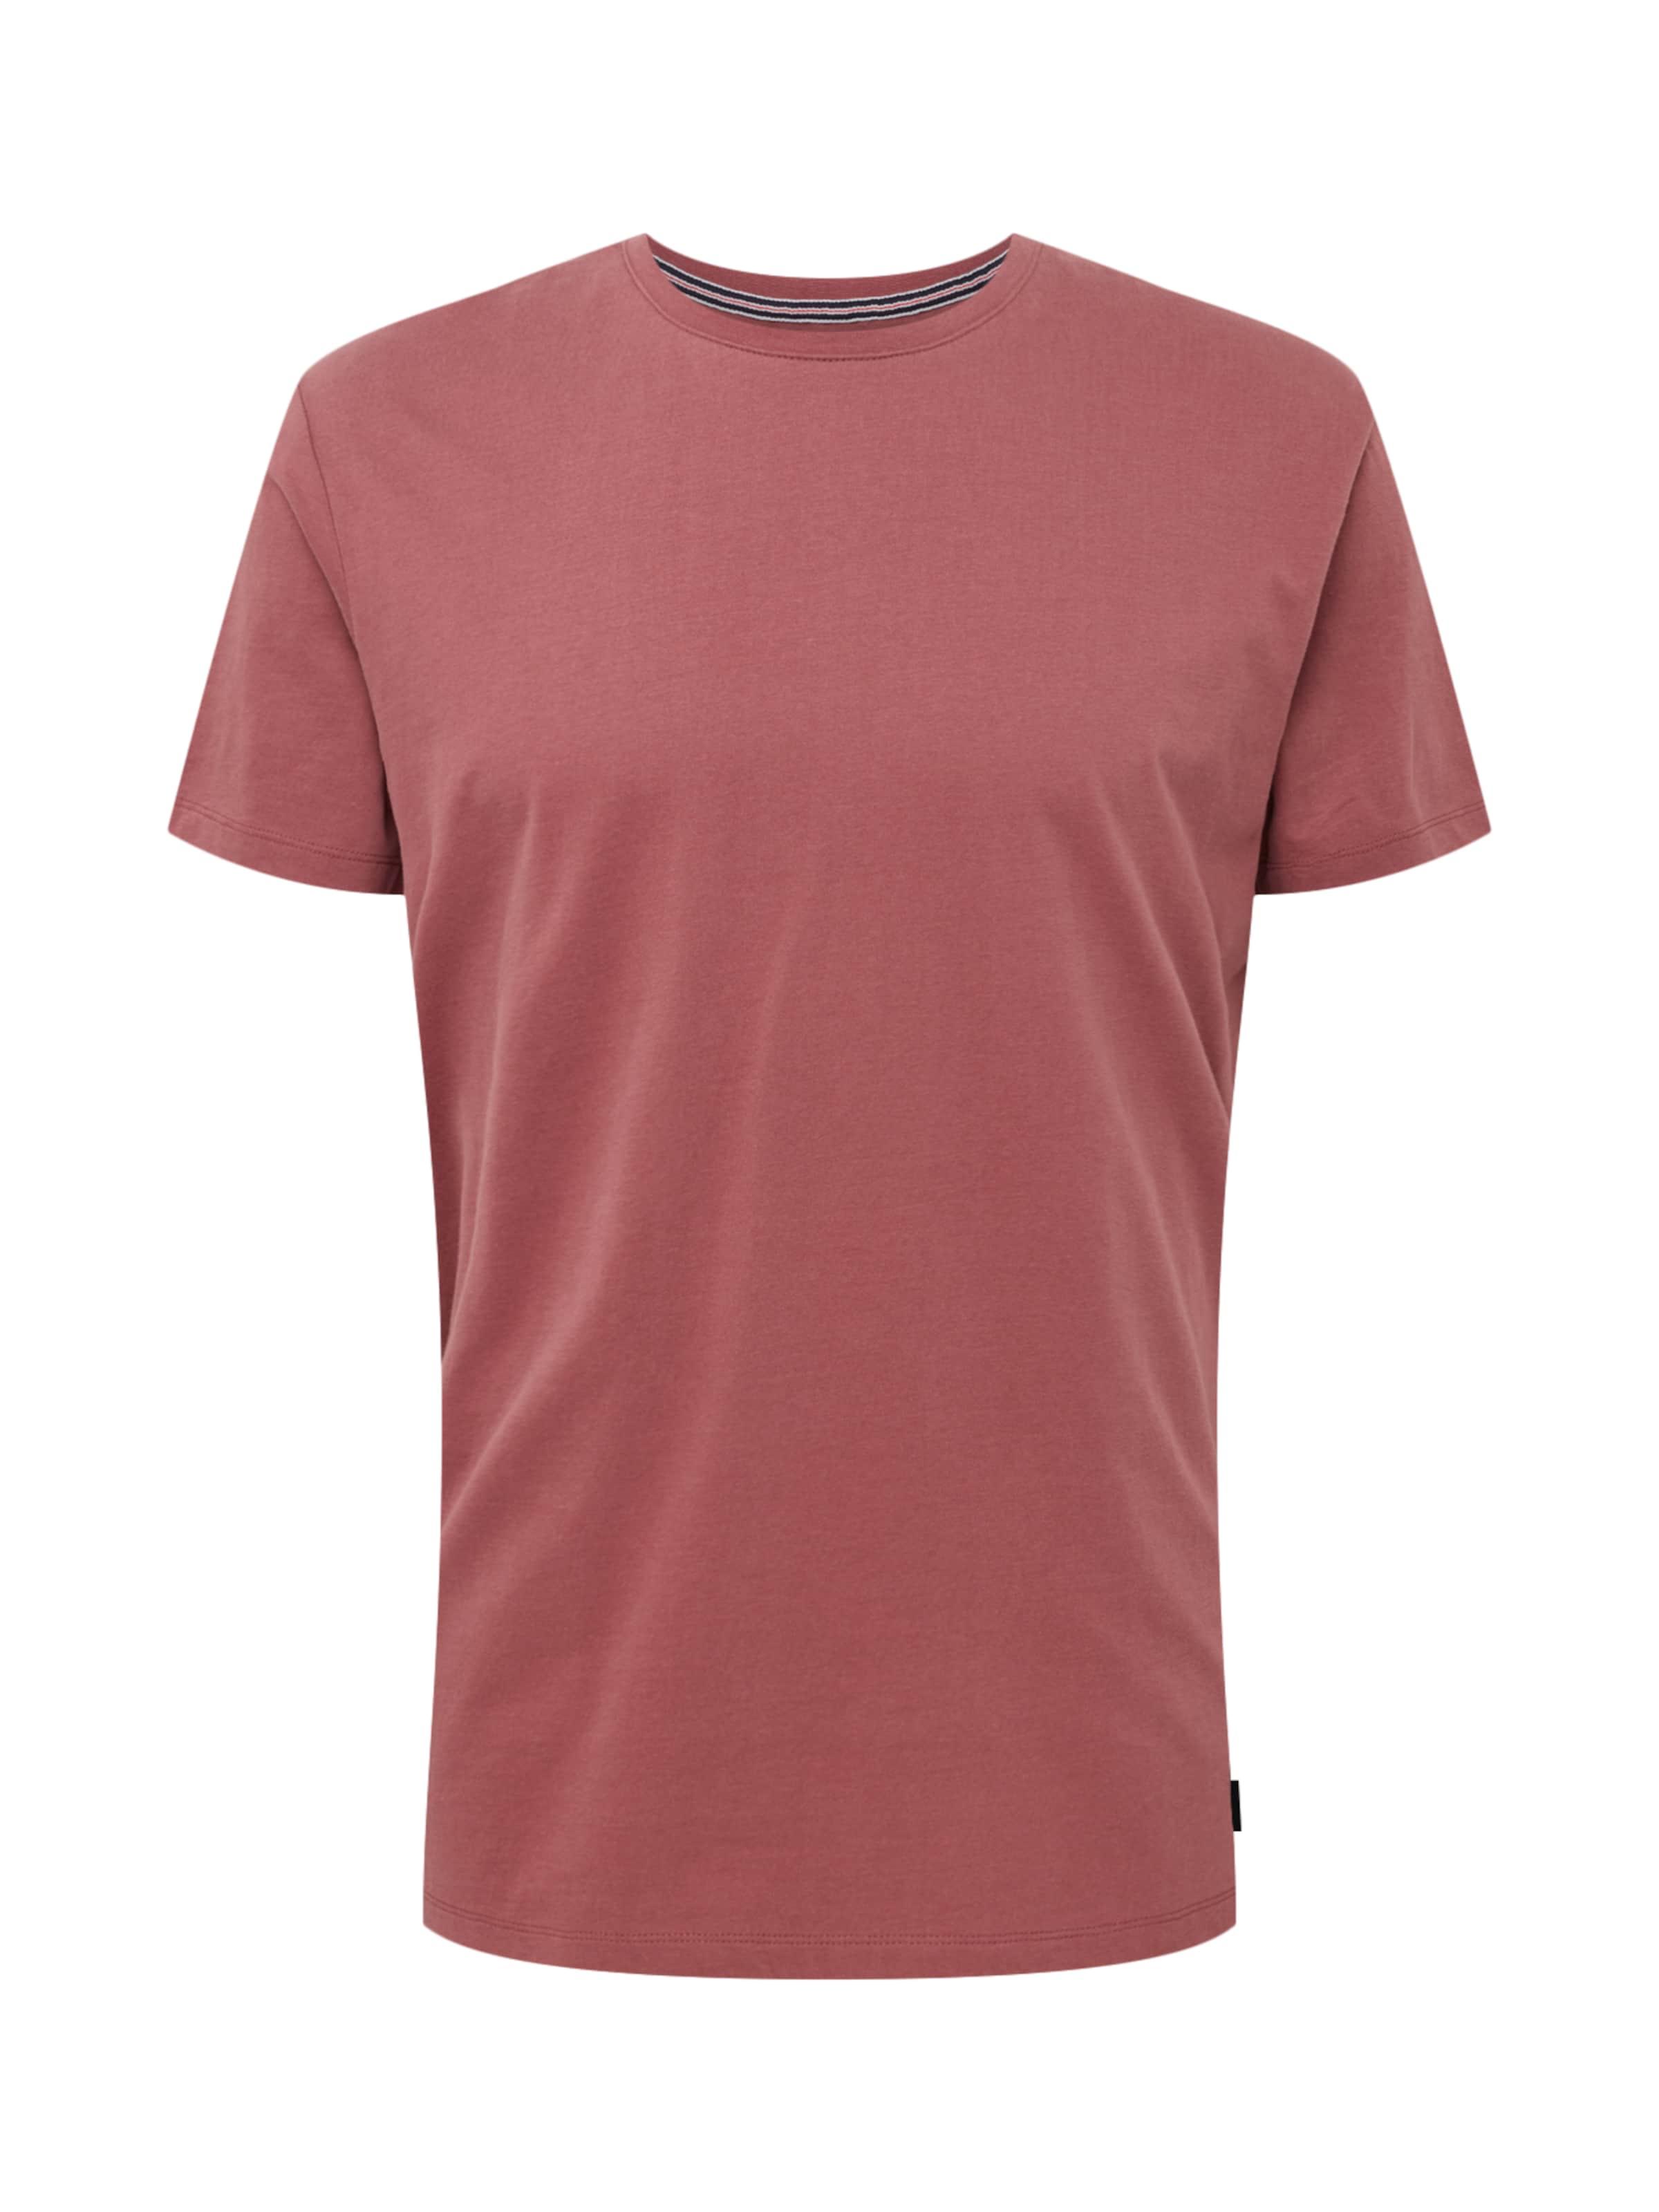 En Rose T shirt Esprit 2IYH9WDeE